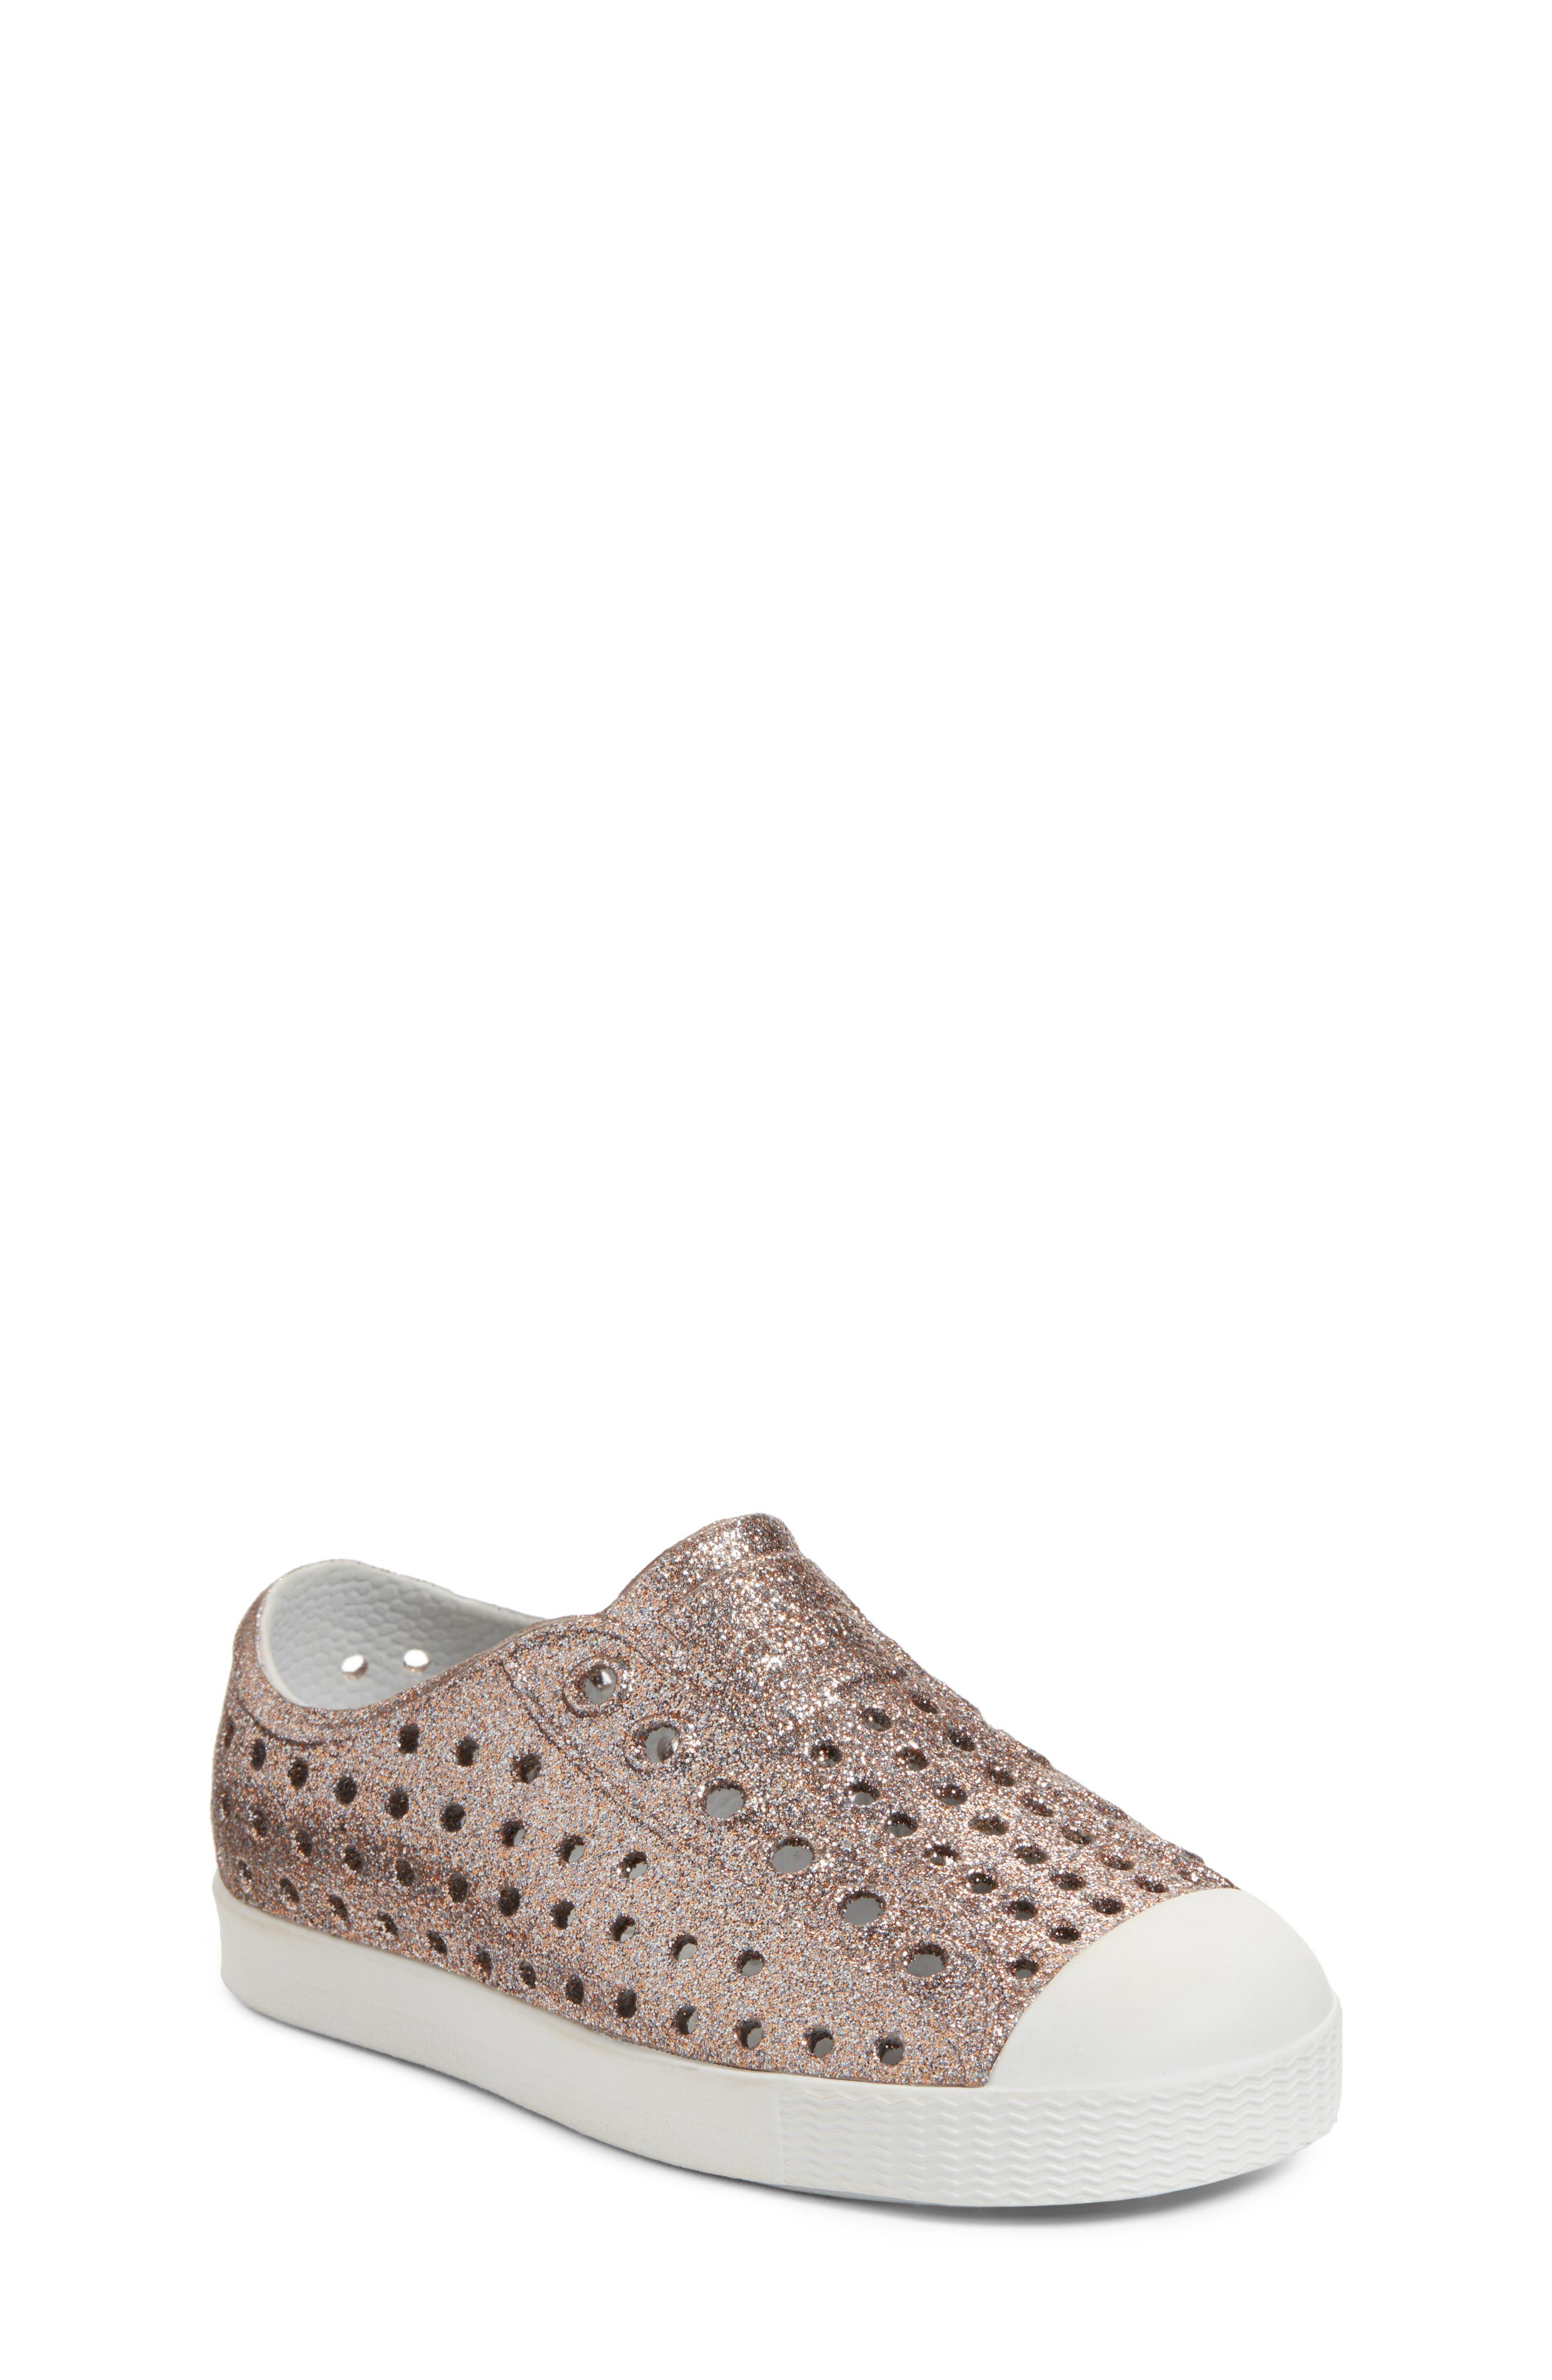 Native Shoes Jefferson Bling Glitter